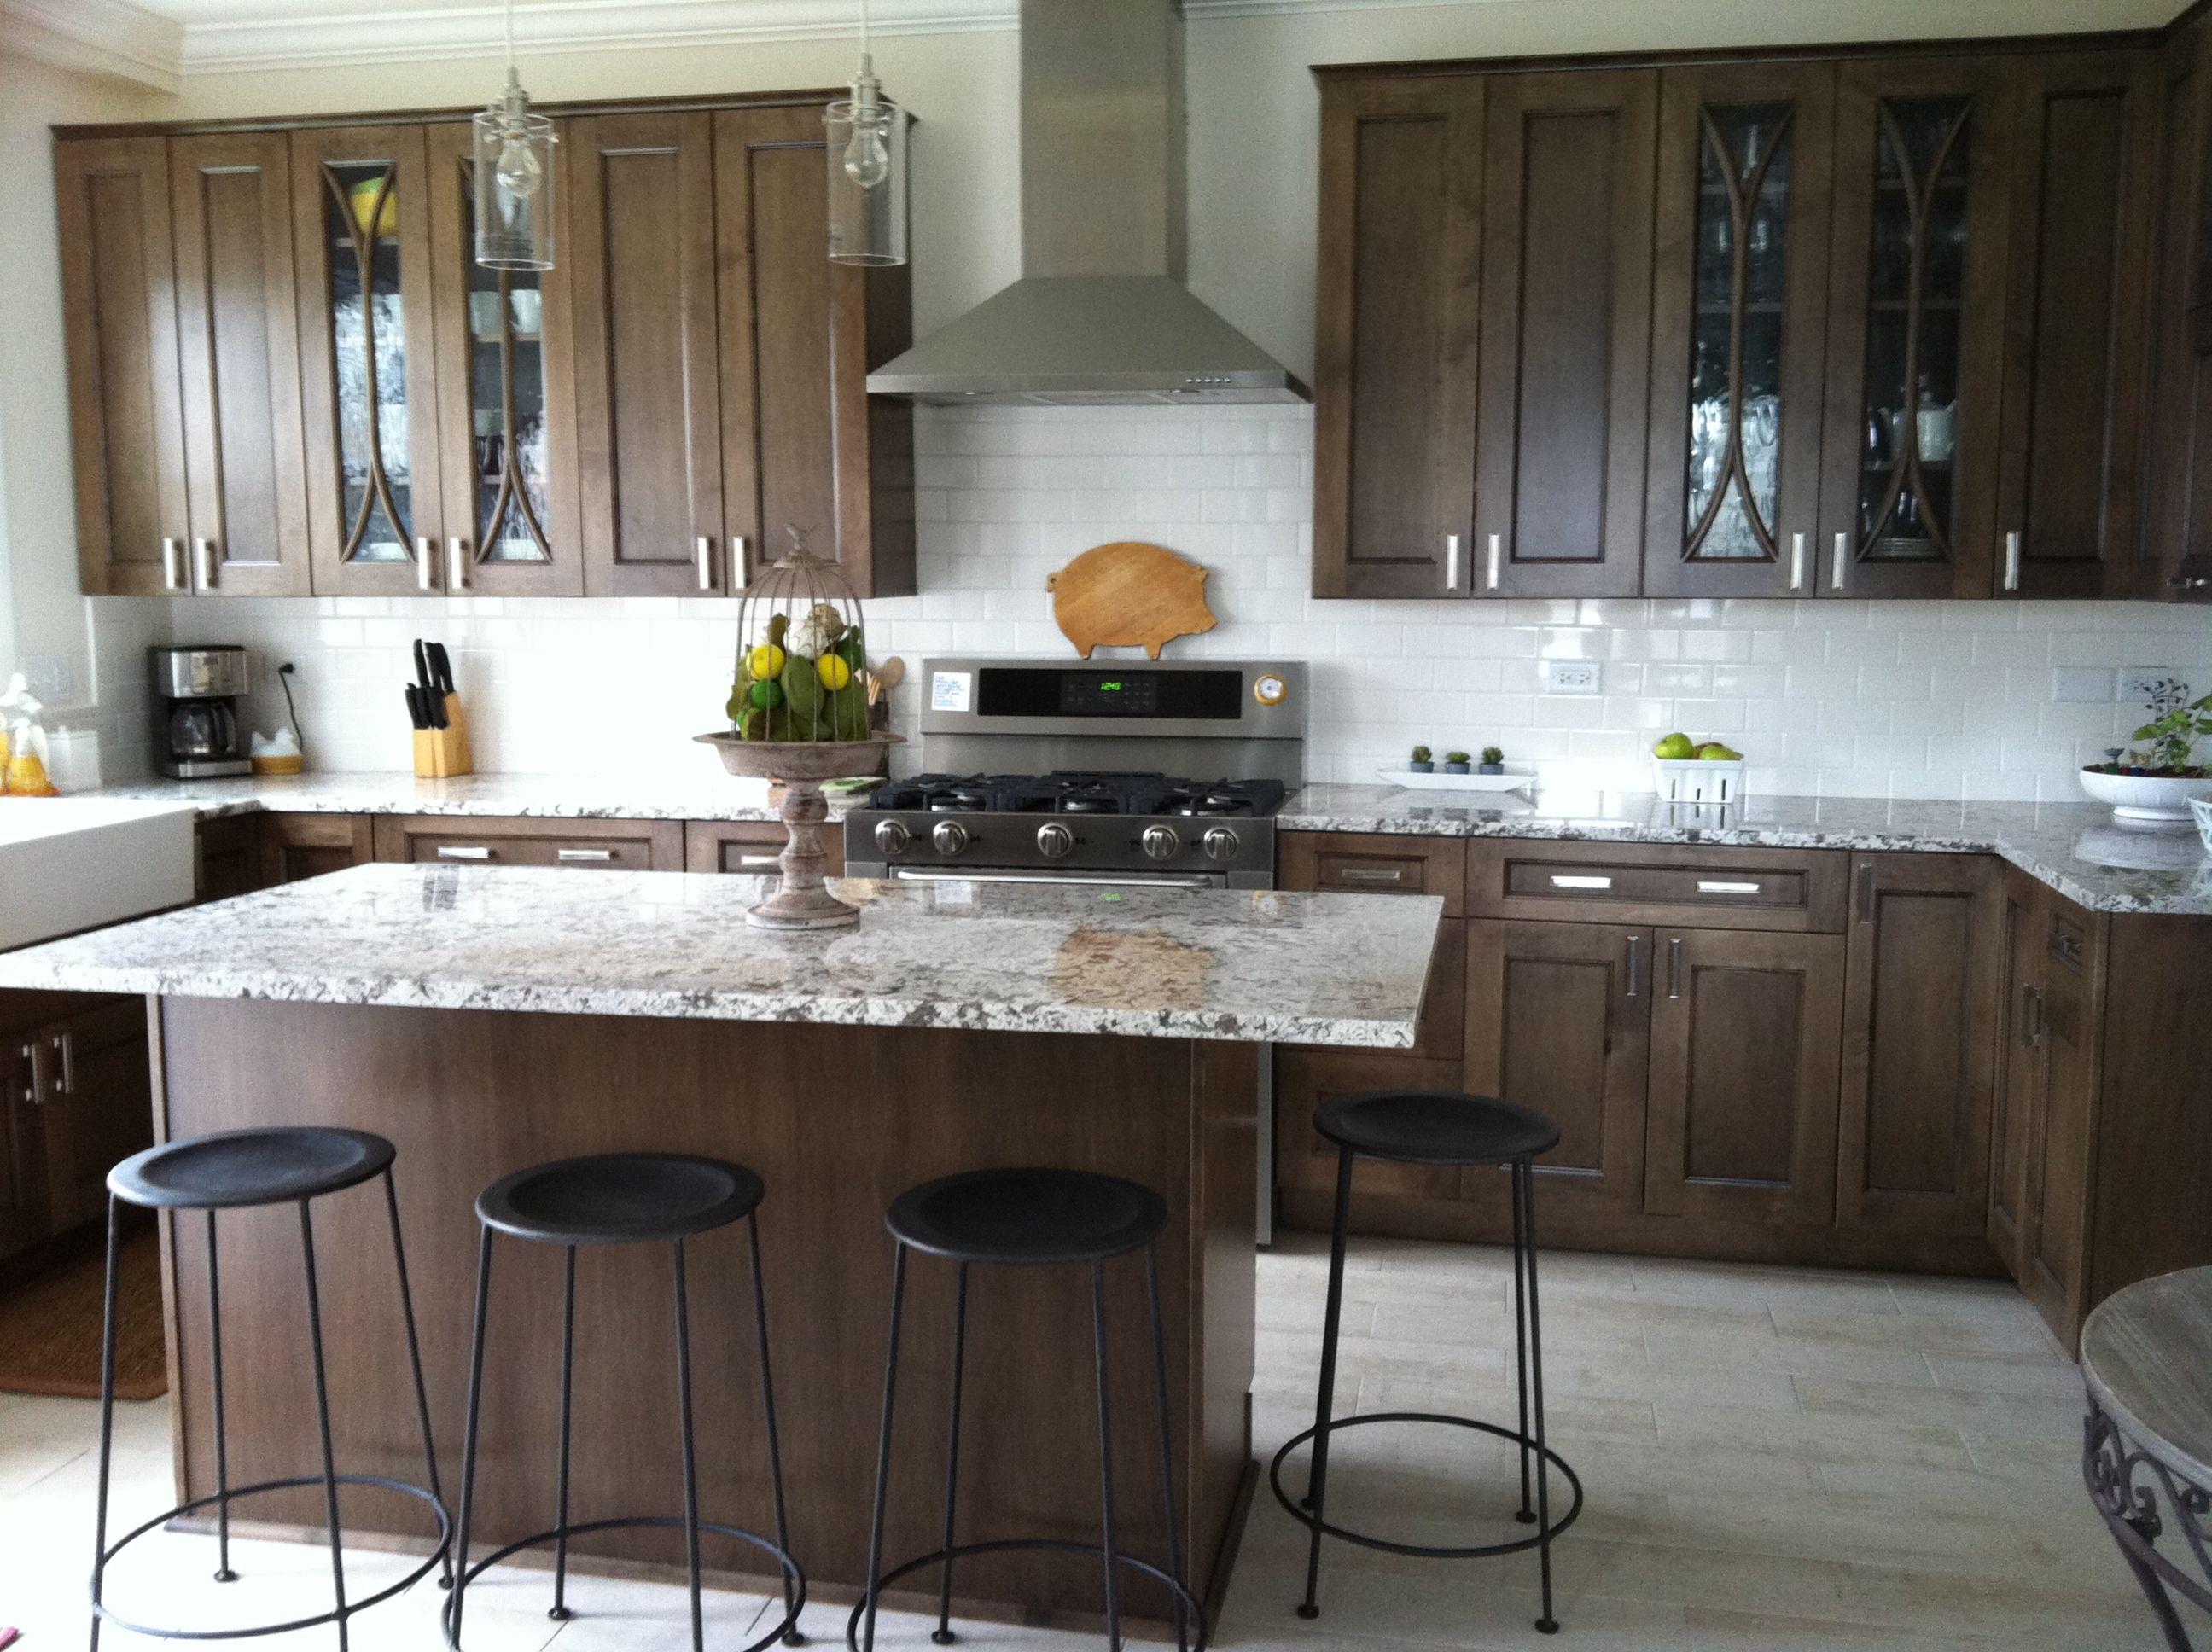 Eagle Rock Sable Glaze Innermost Cabinets Kitchen Remodel Kitchen Design Home Kitchens